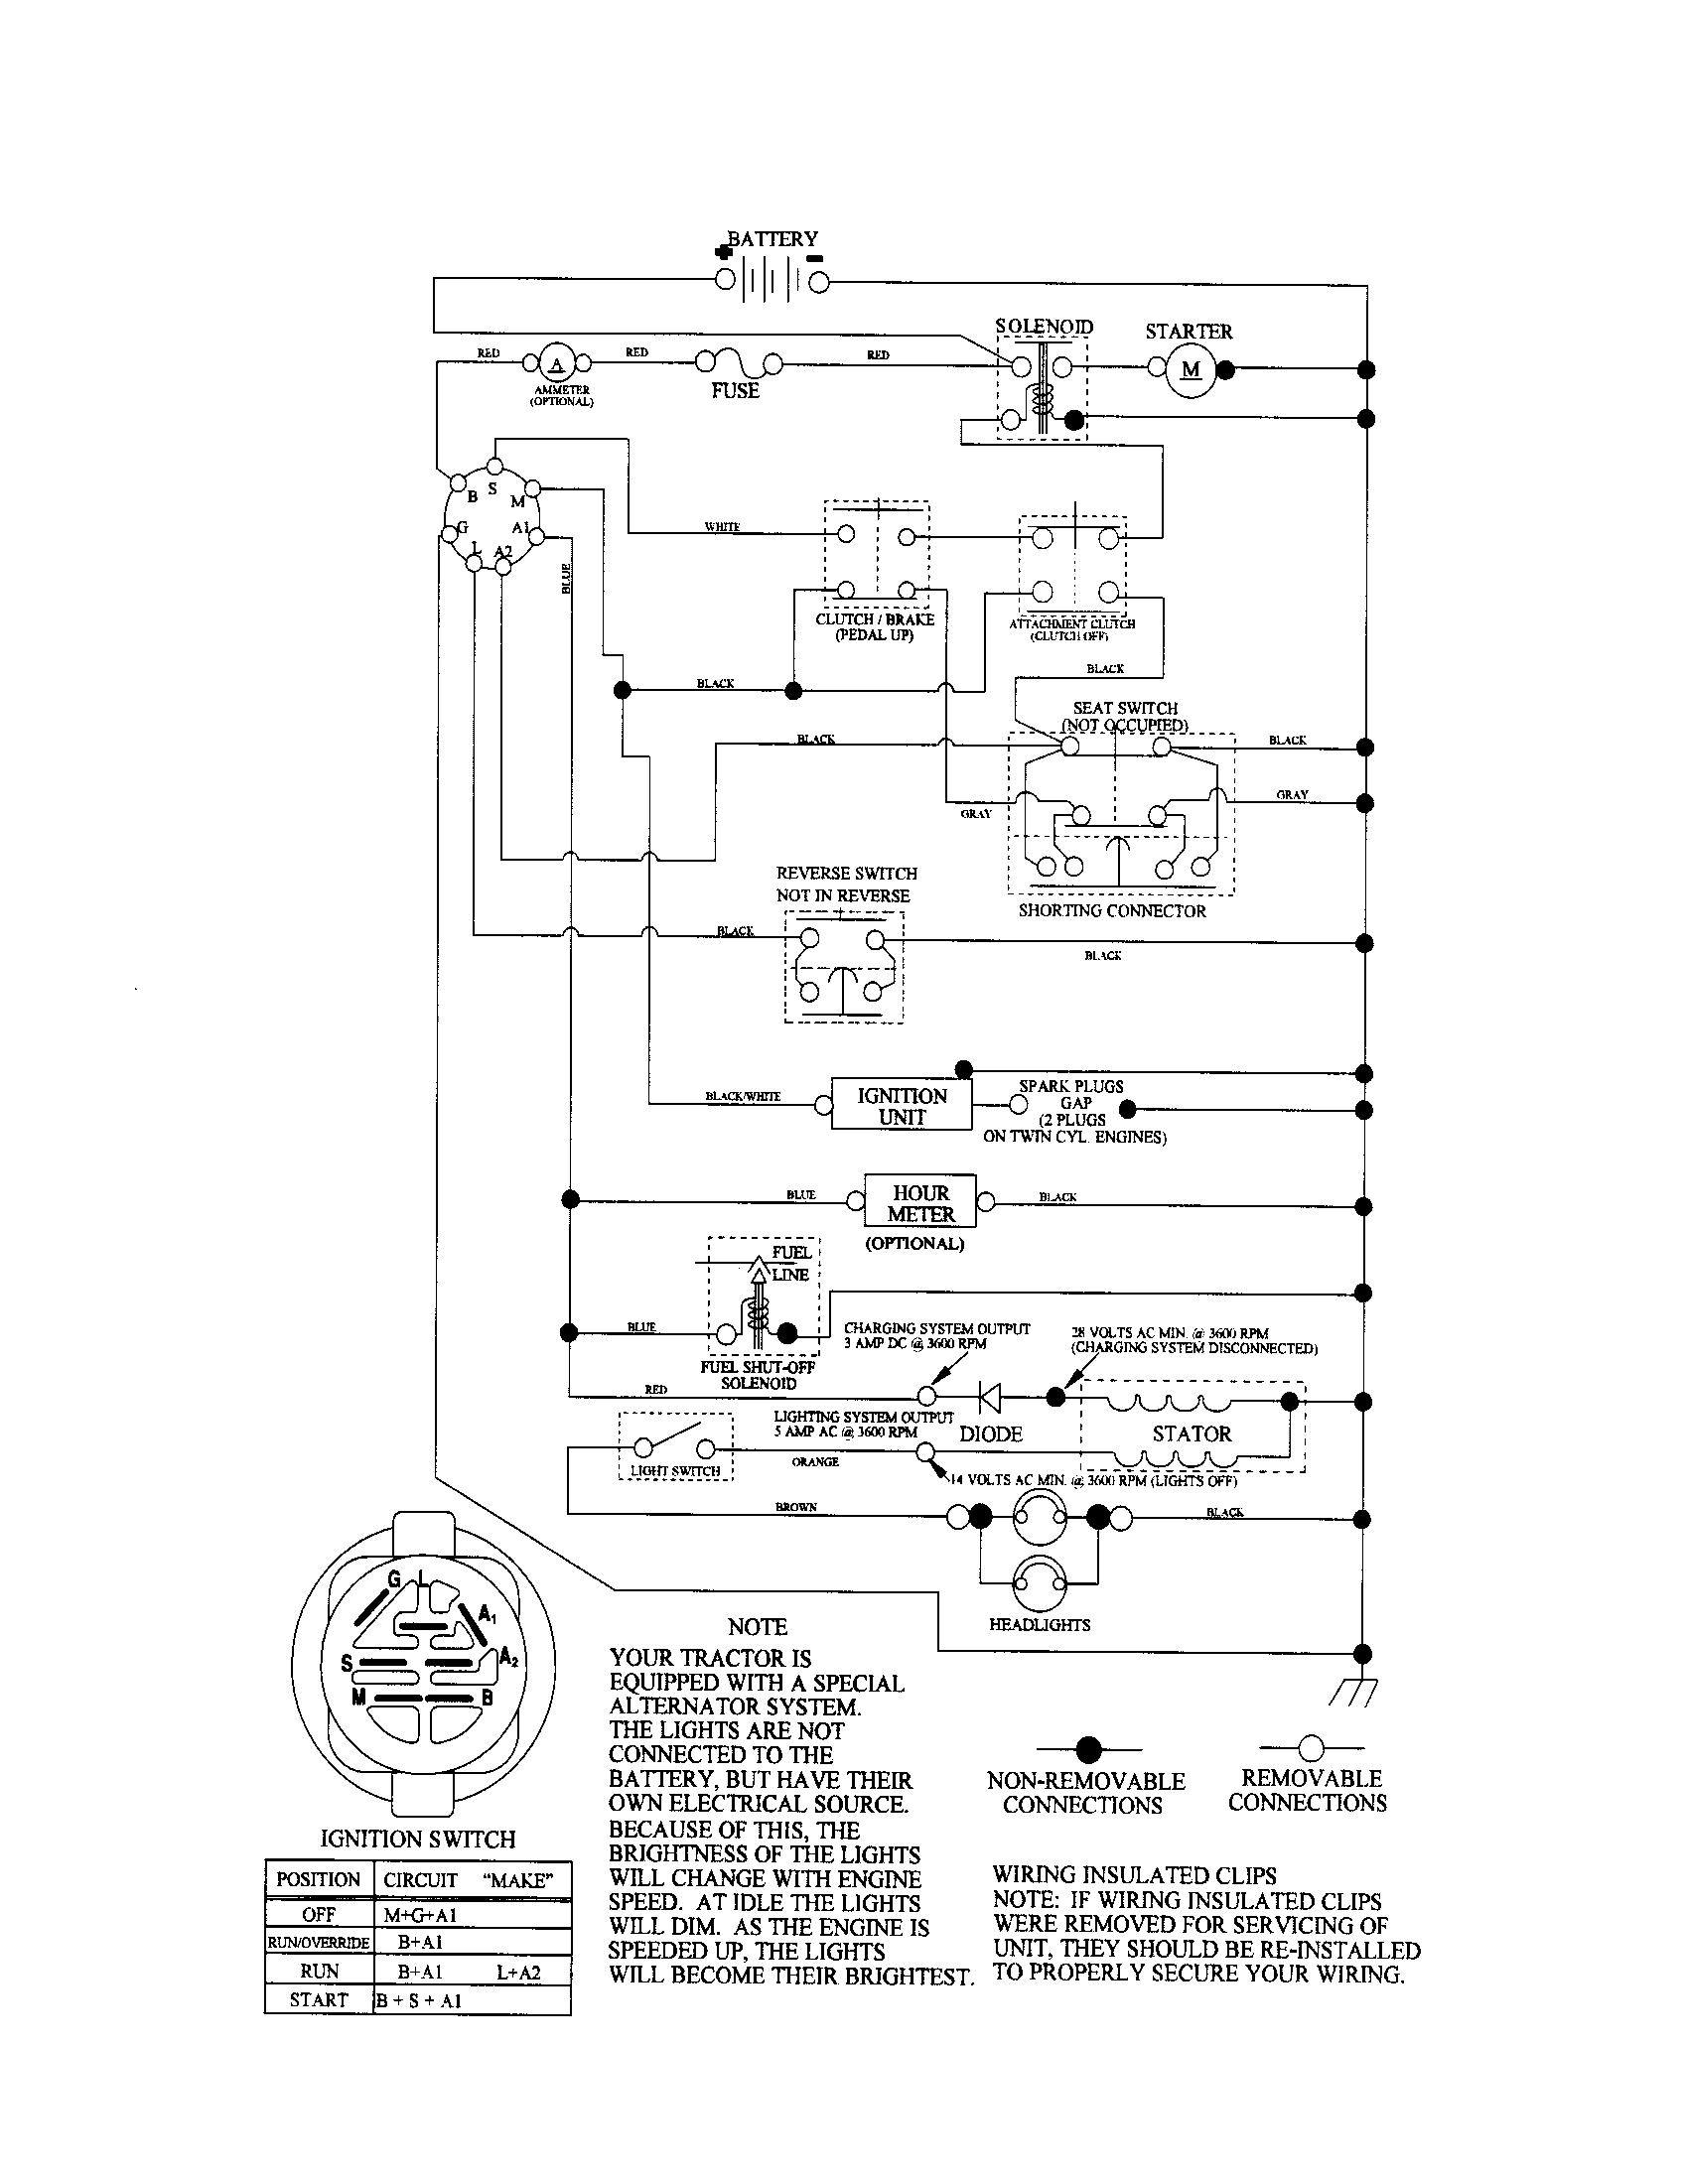 Husqvarna Yth2148 Wiring Diagram